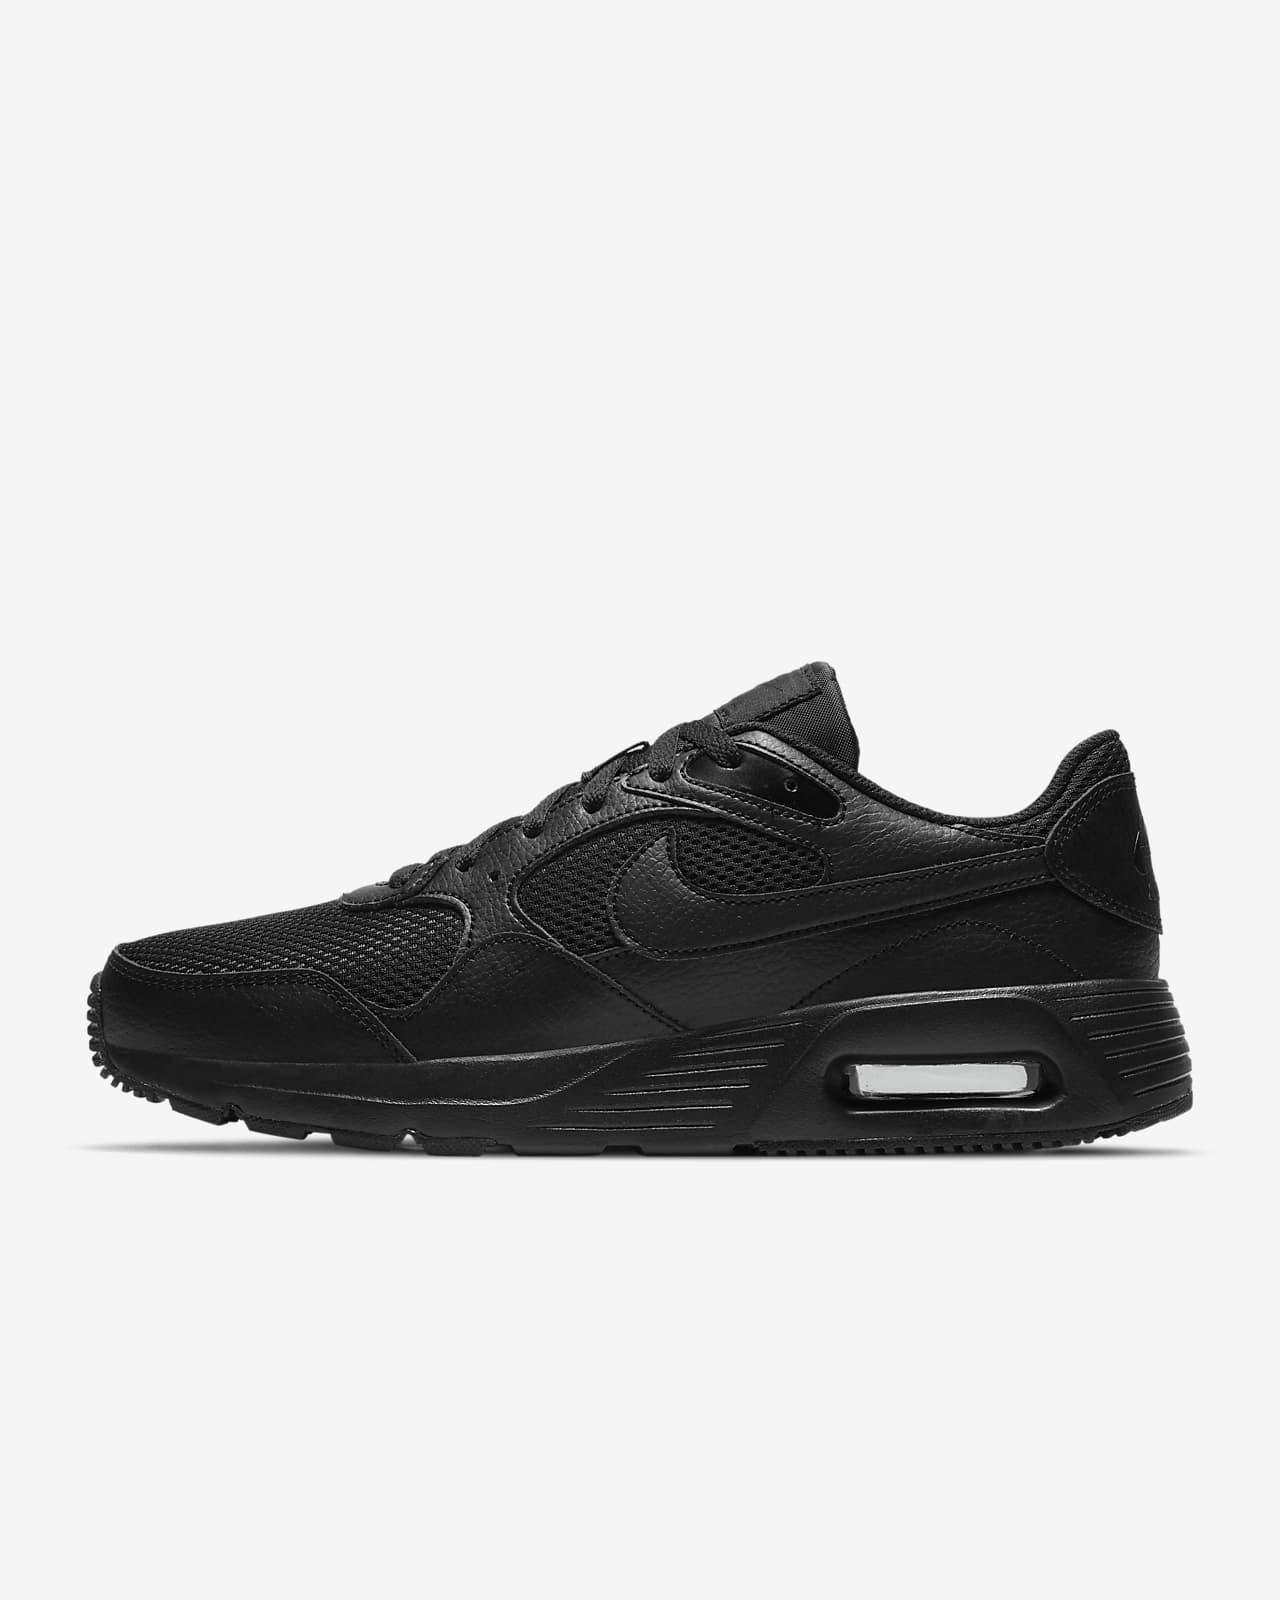 Chaussure Nike Air Max SC pour Homme